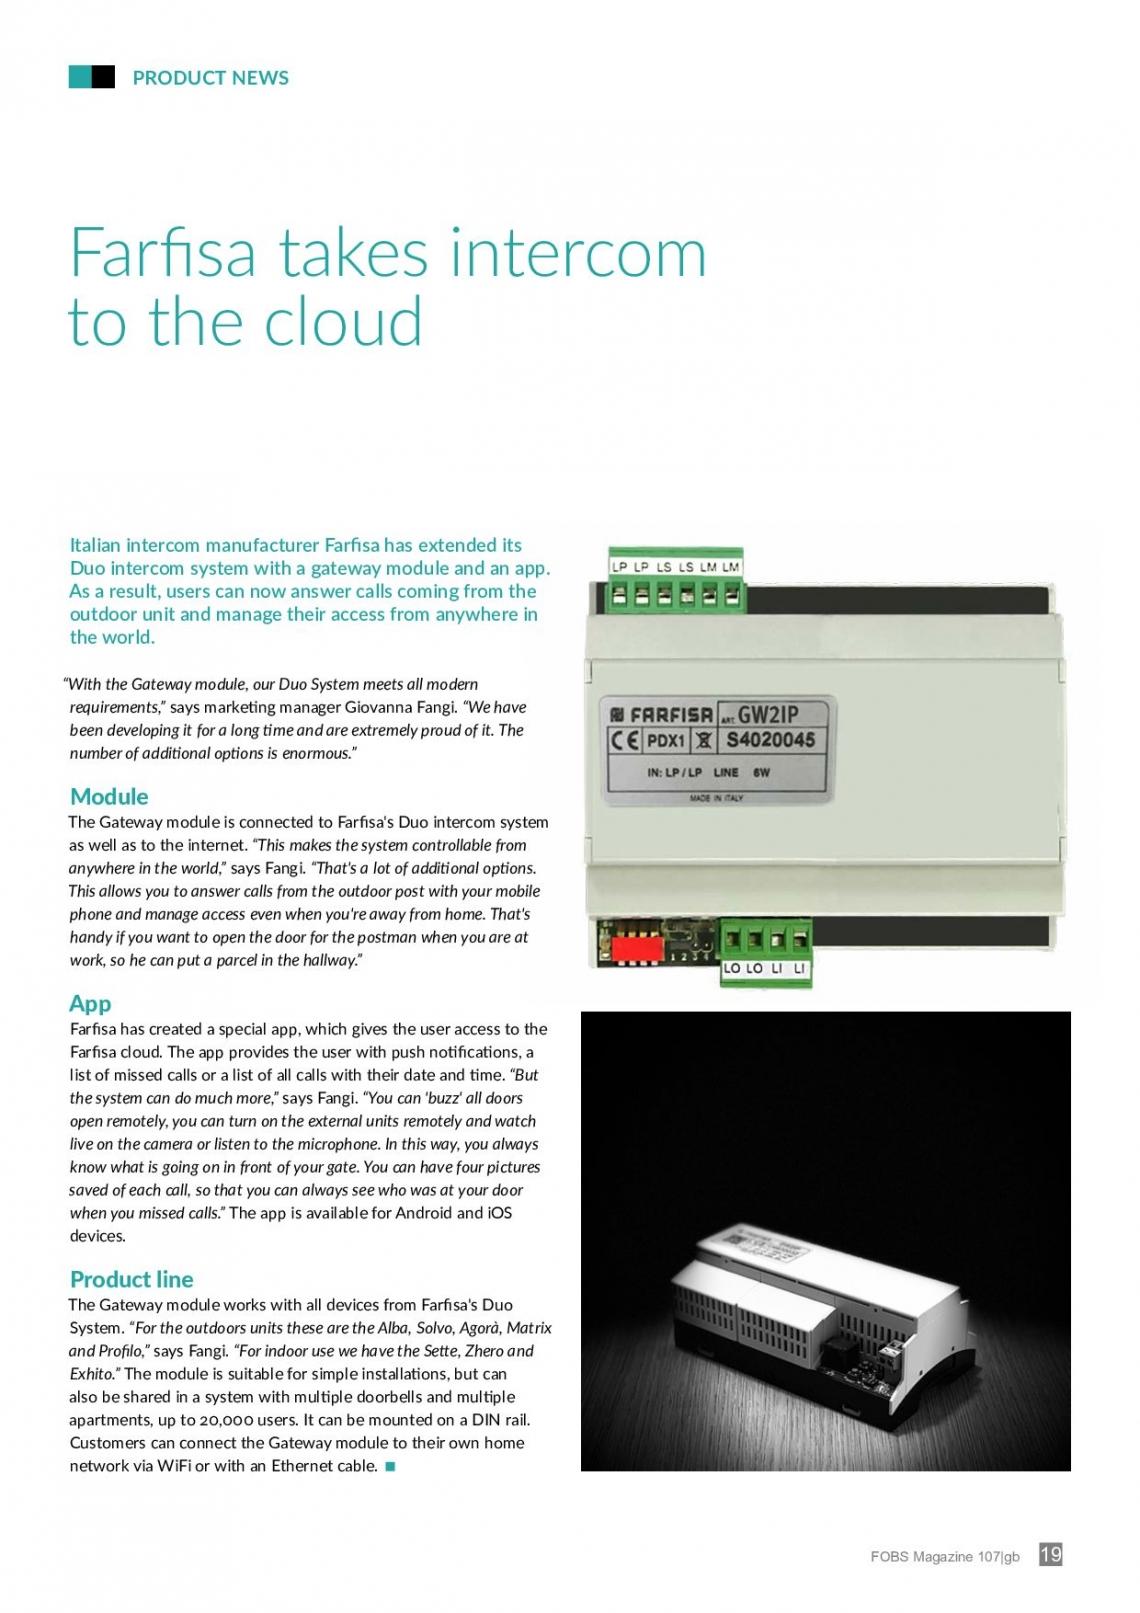 Farfisa takes intercom to the cloud